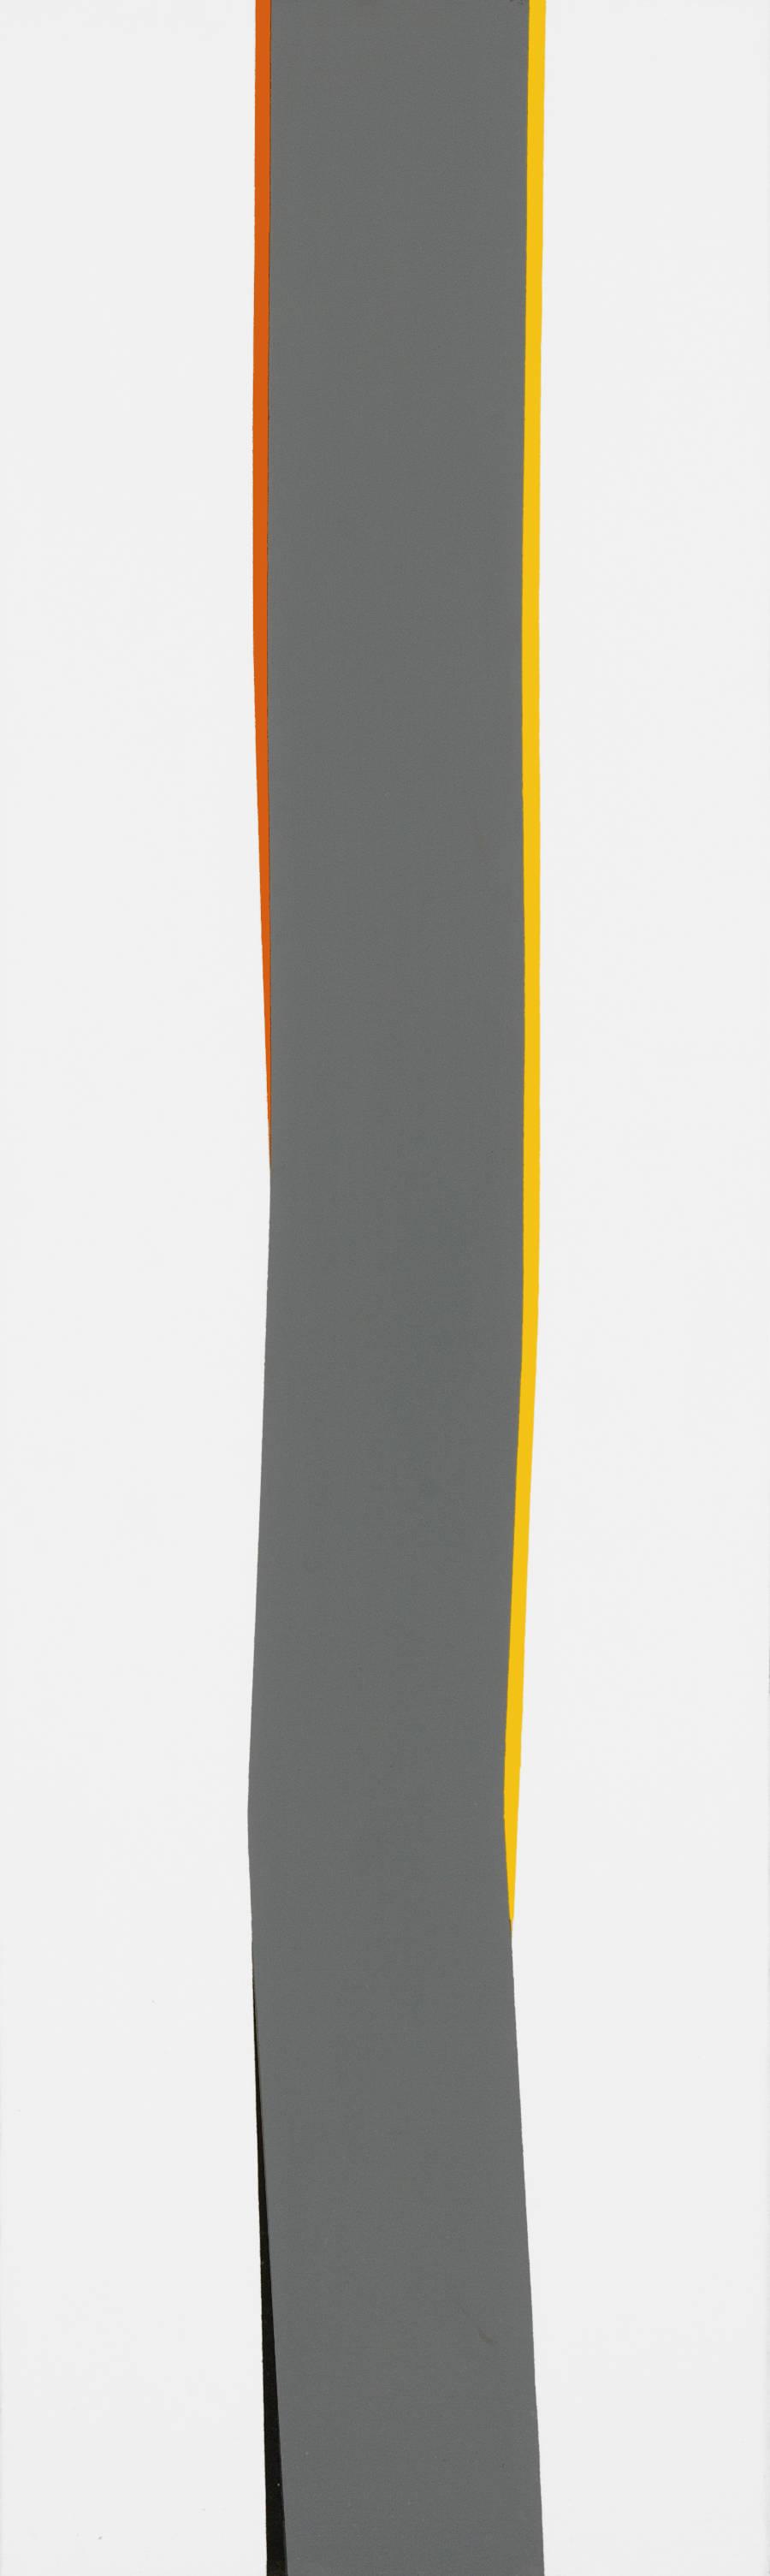 Claudio Verna, Colonna, 1967. Oil on canvas 200 x 60 cm 78.7 x 23.6 inch.